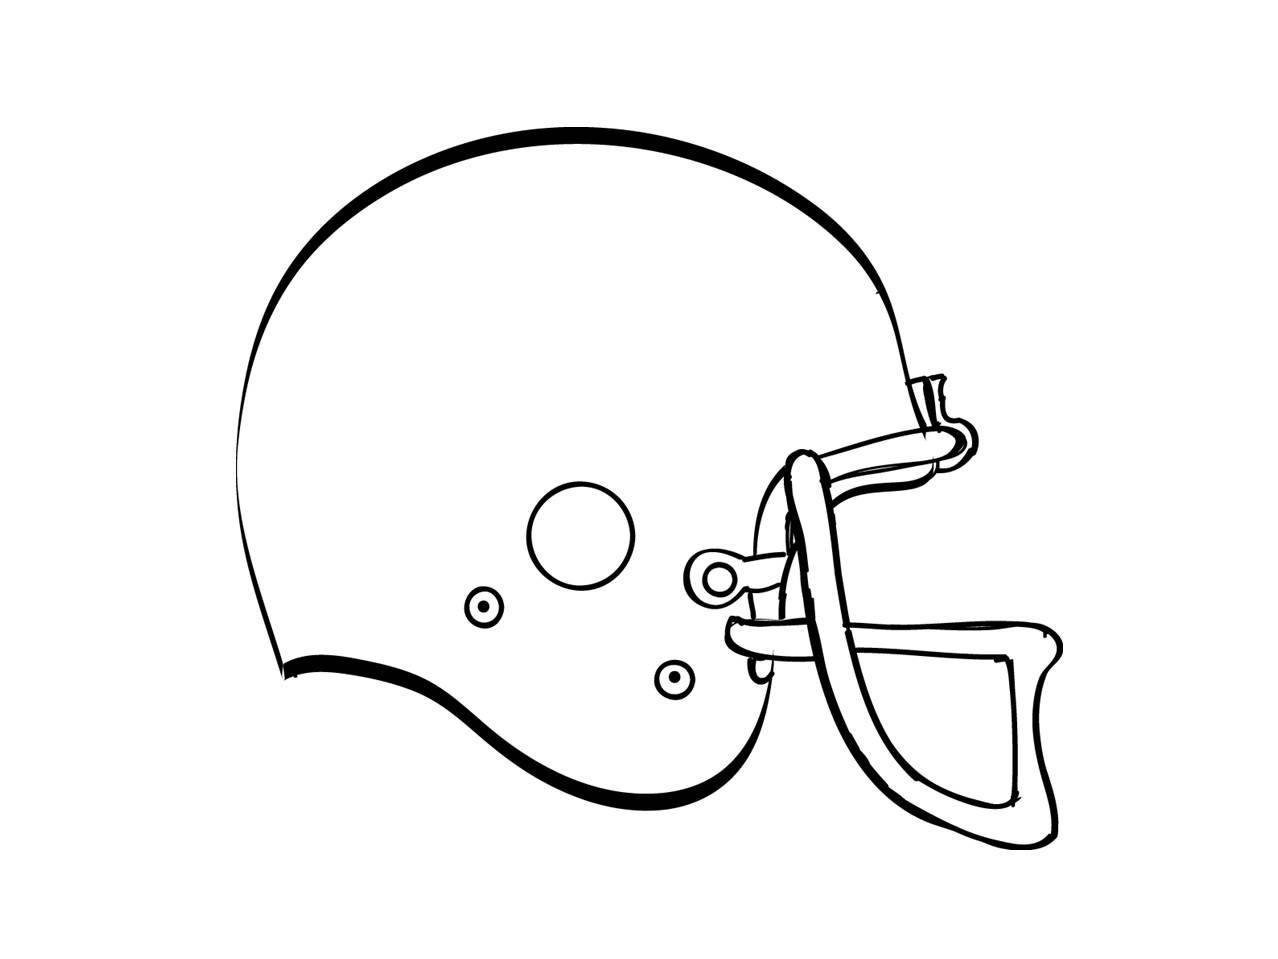 1278x959 Football Helmet Clip Art Black And White Football Helmet Coloring